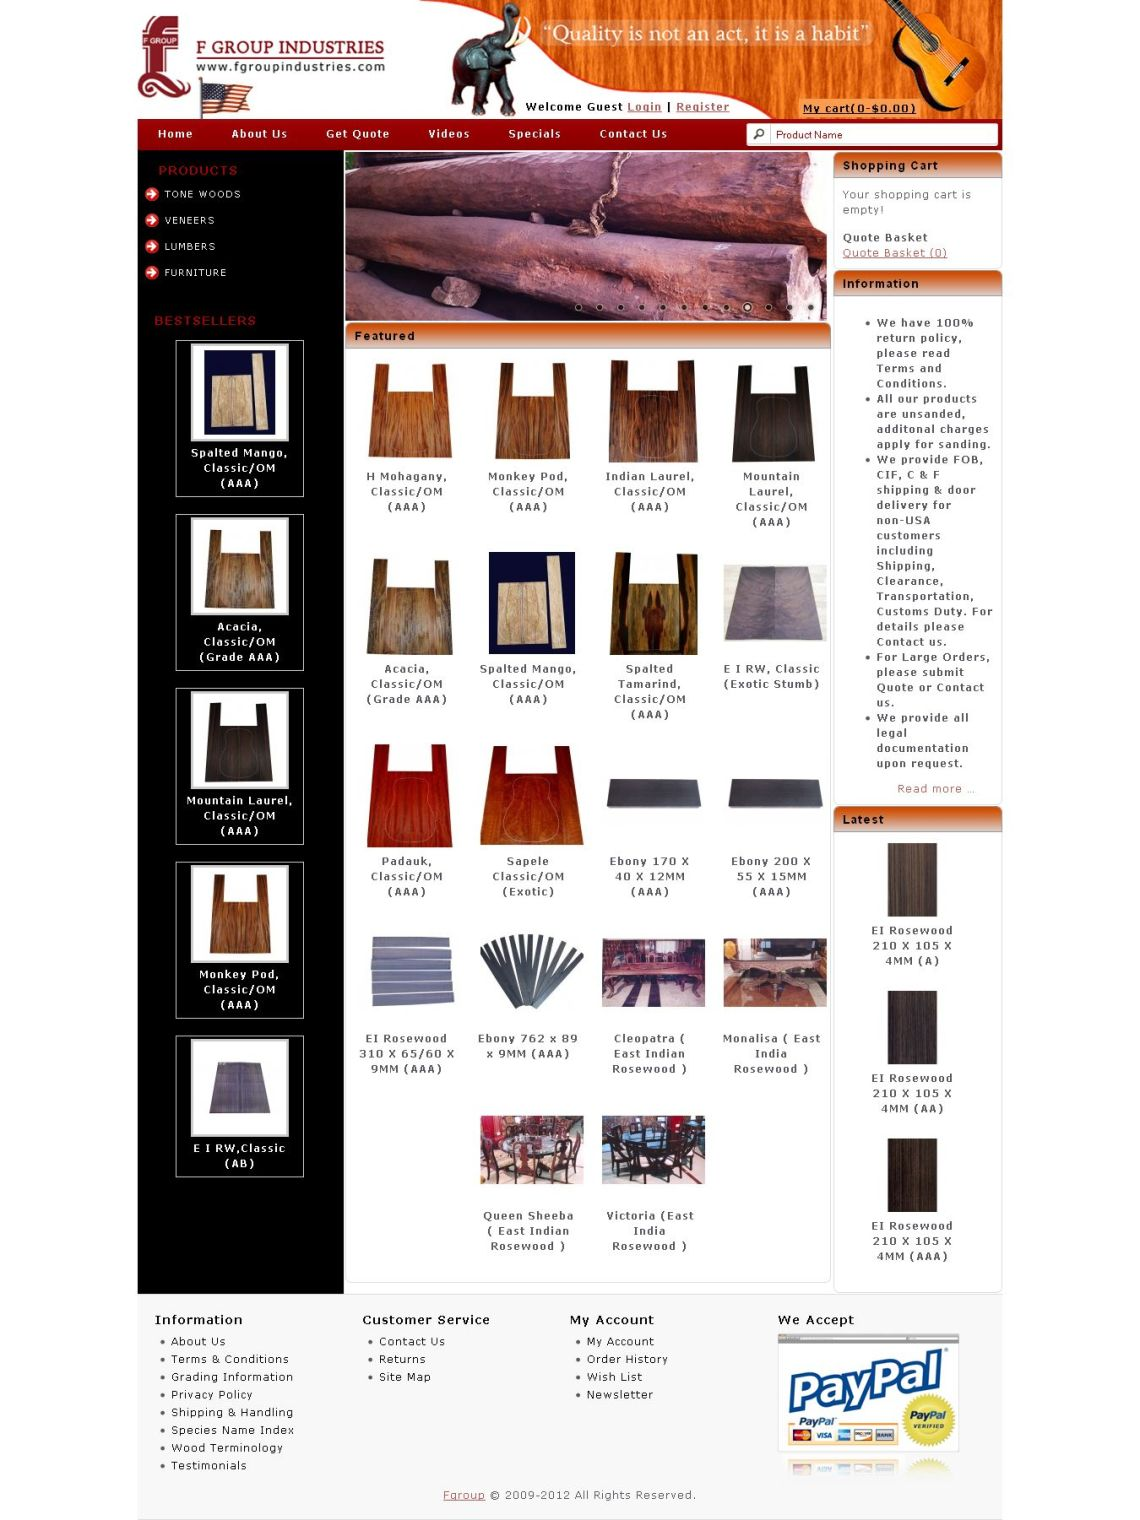 Web Design Dubai,Web Design India, Web Design kerala, website design Dubai, web site design kerala, web design company dubai, web developers kerala